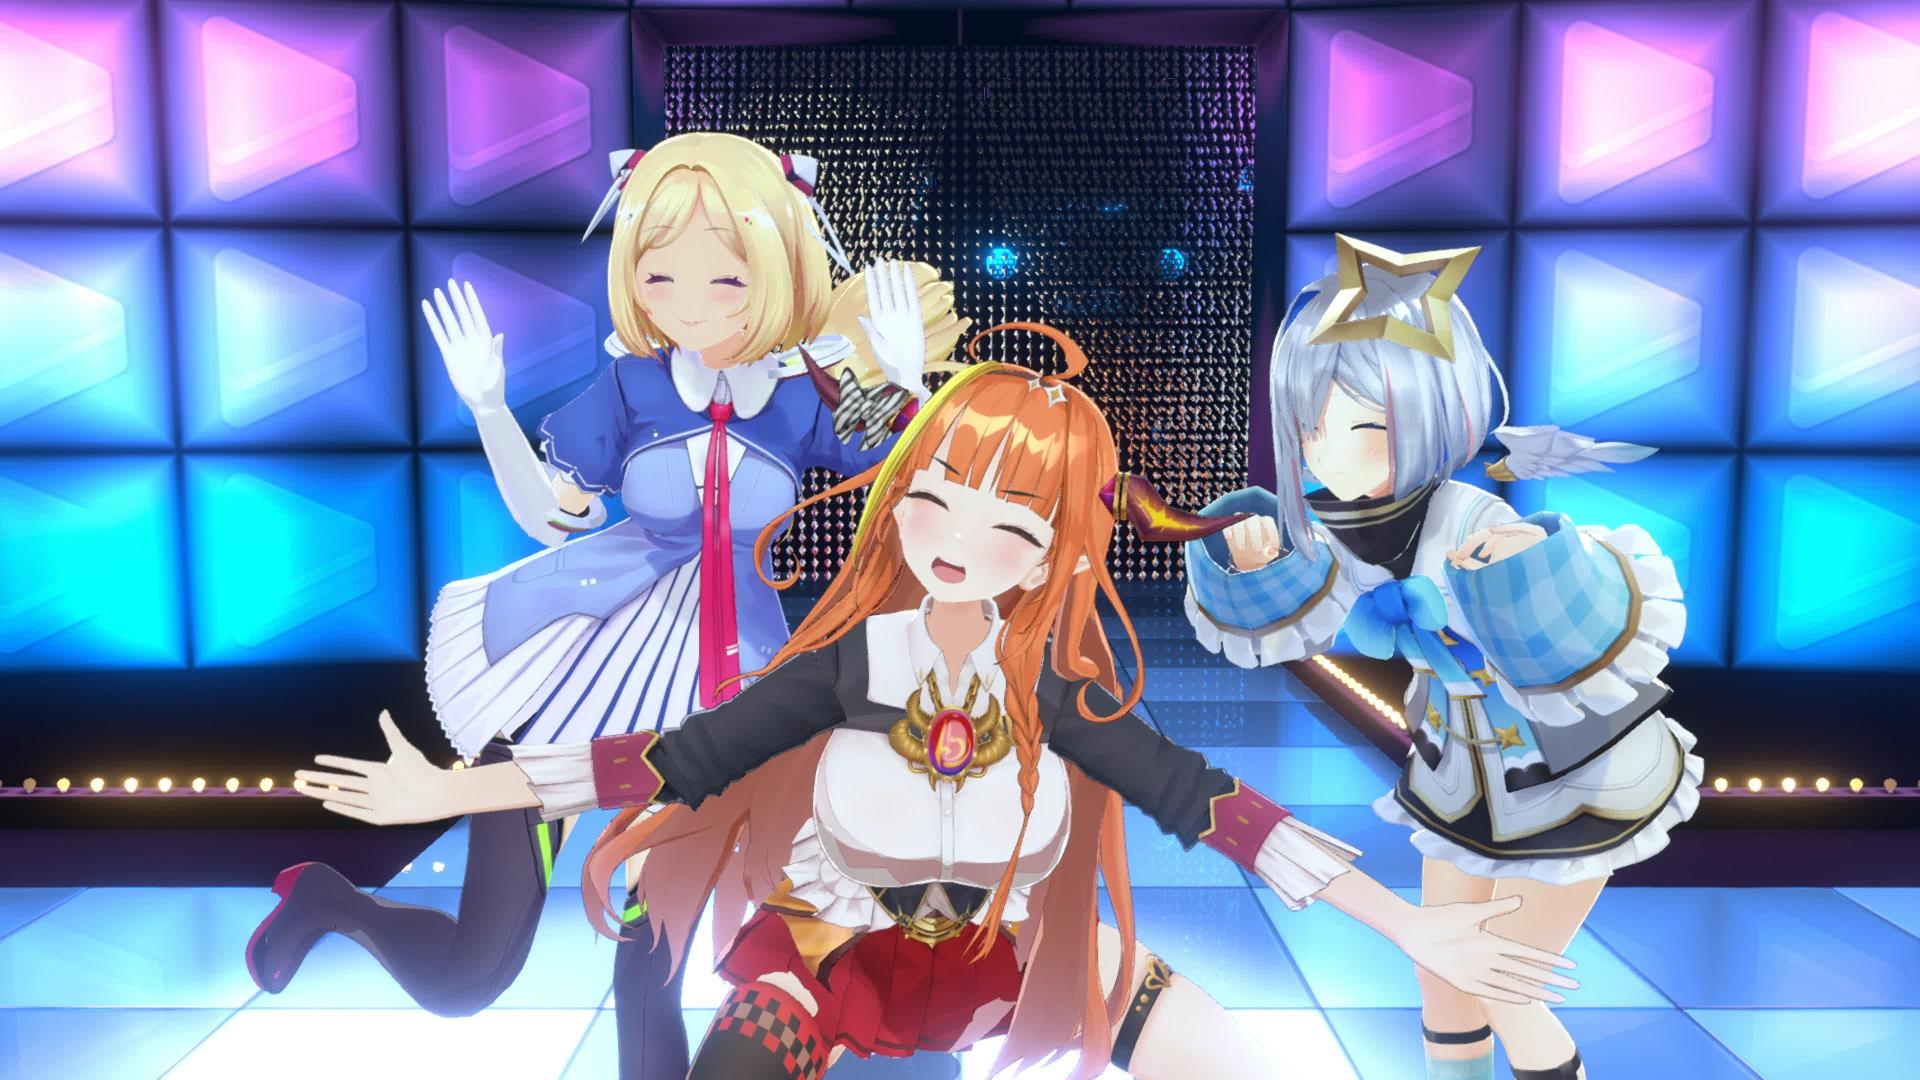 Coco, Kanata, and Aki of Hololive